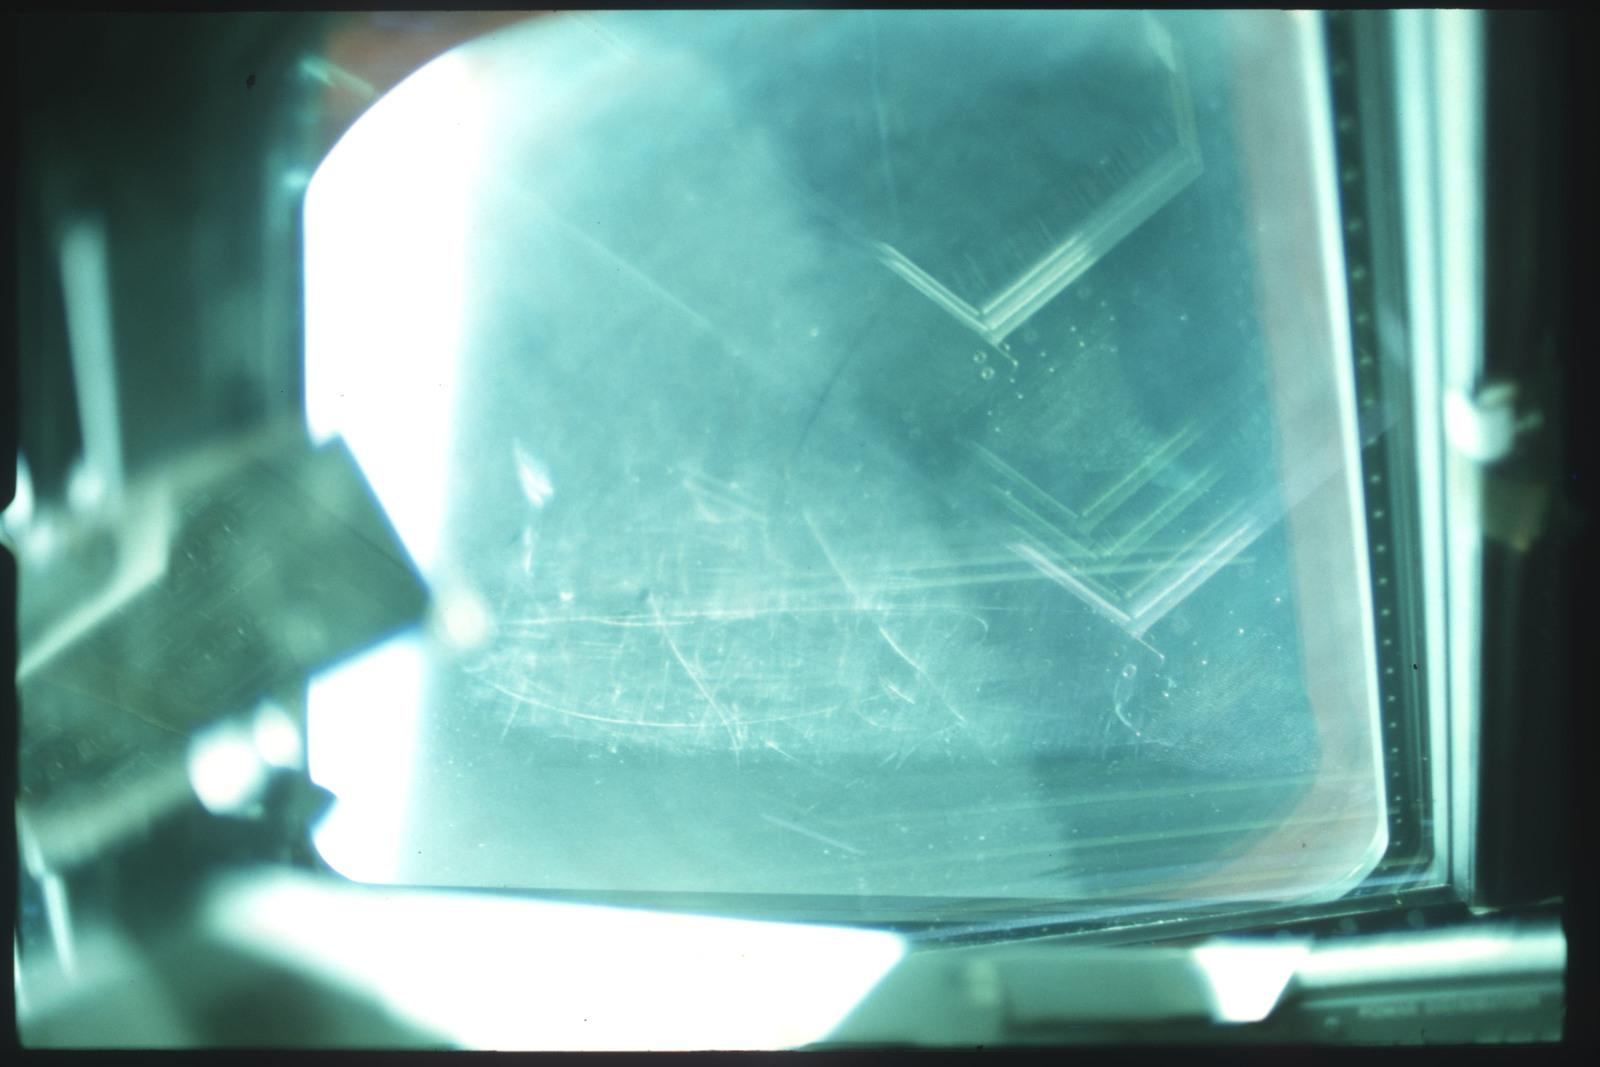 S01-07-514 - STS-001 - Crew compartment flight deck window debris,damage,streak documentation